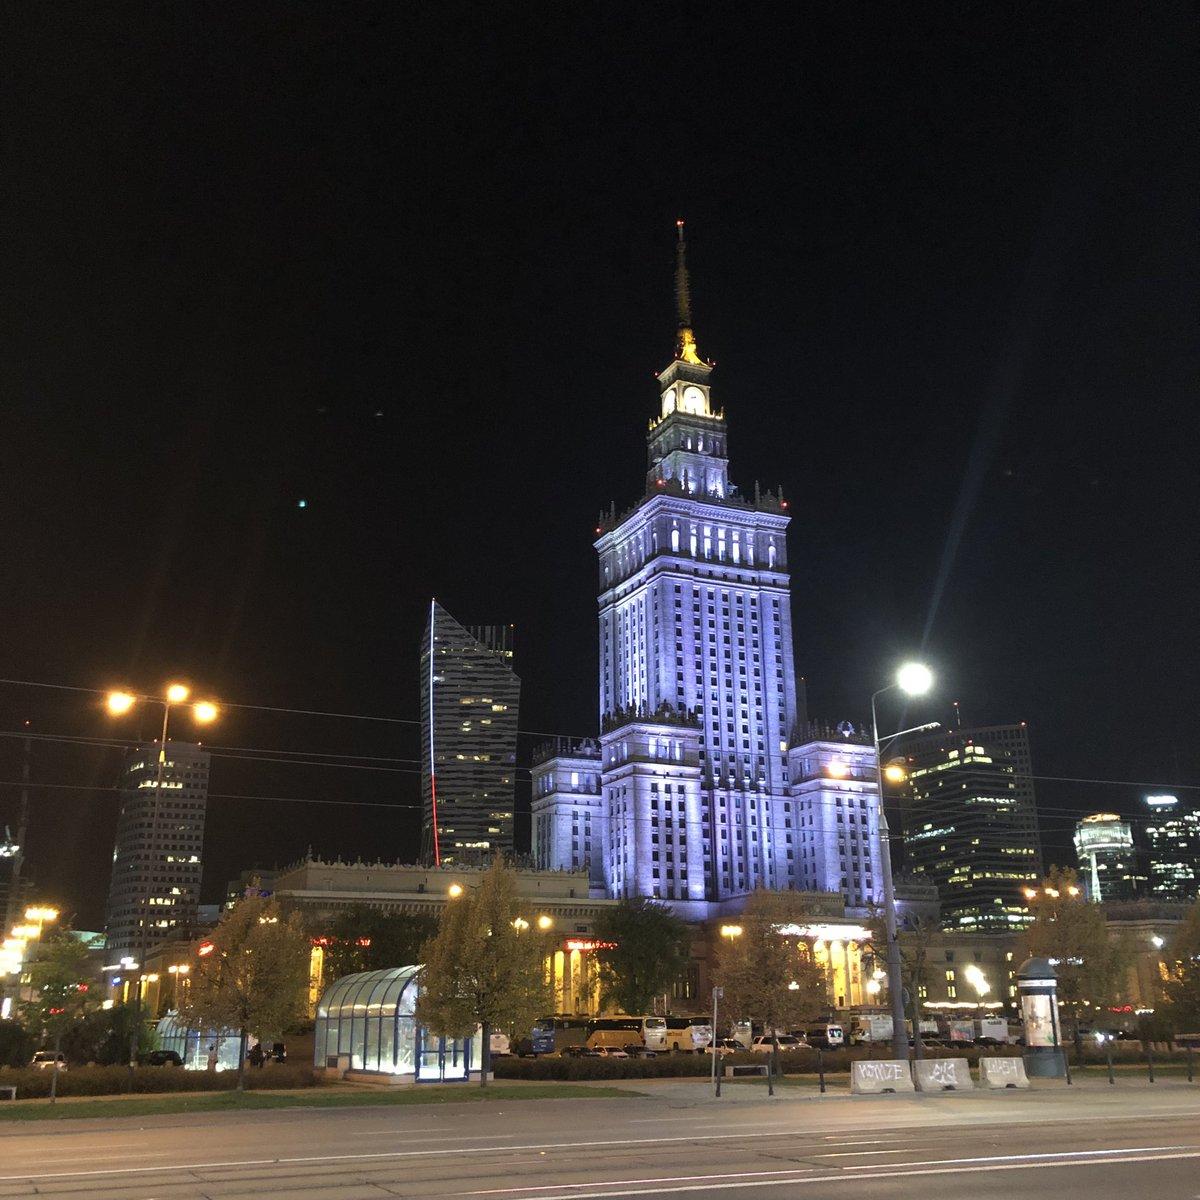 Good night, Warsaw...